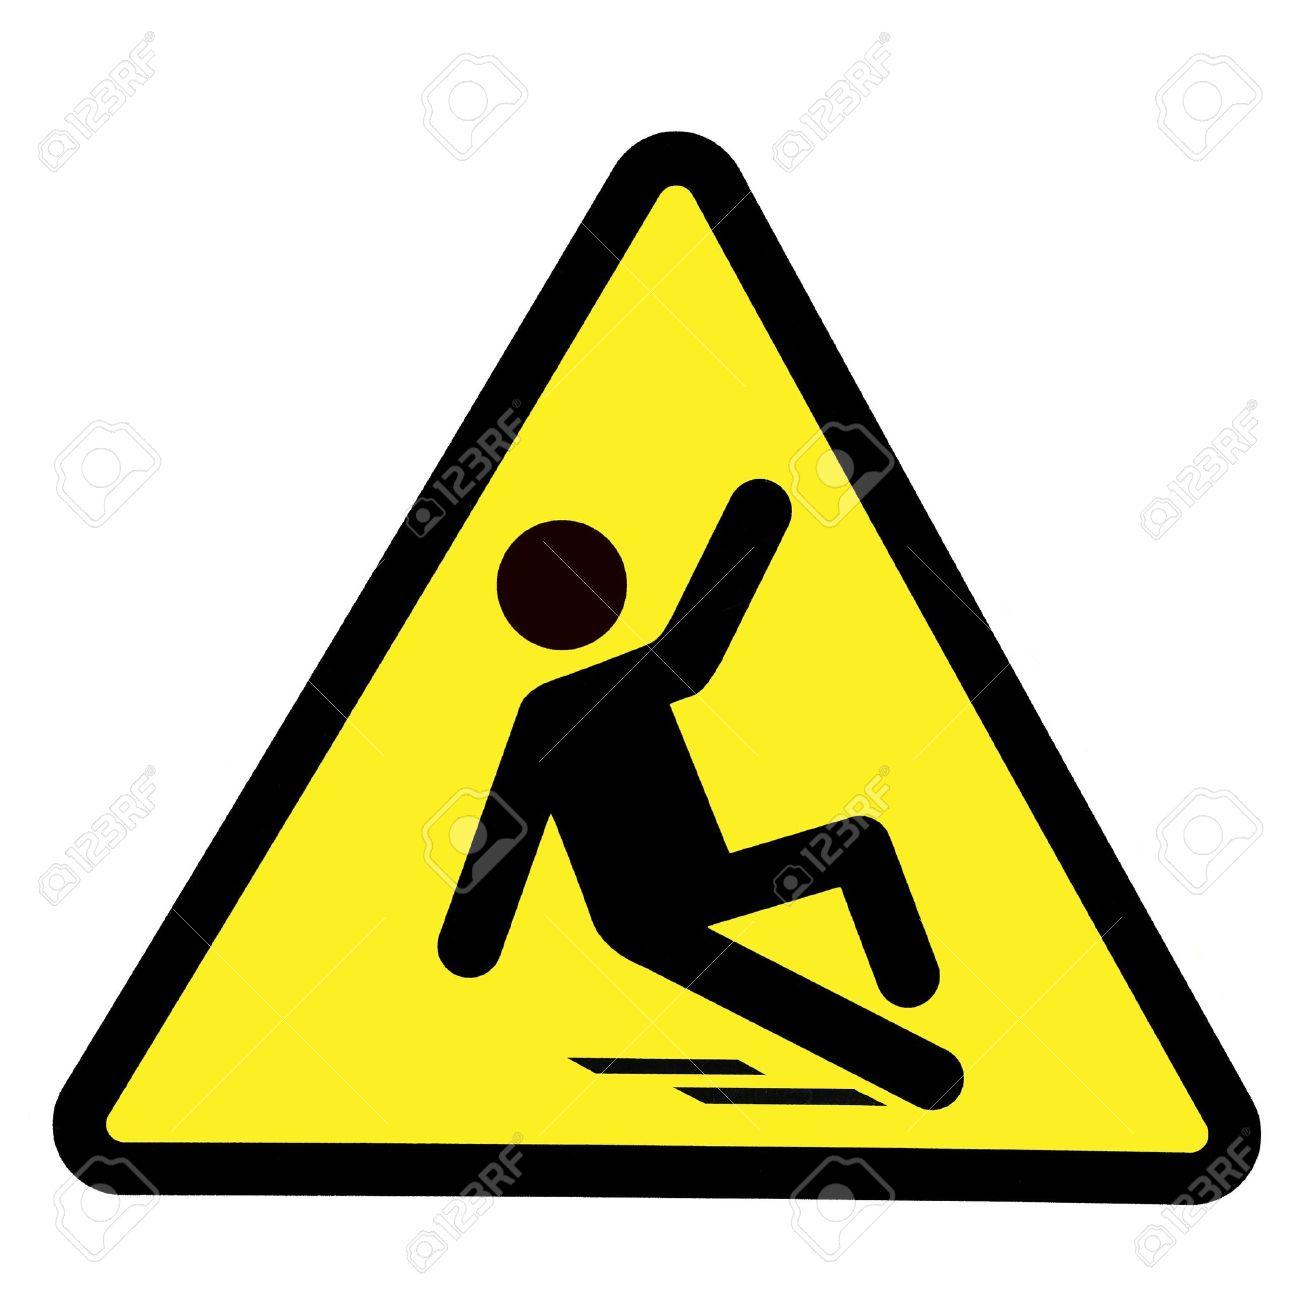 Slippery wet floor sign, wet floor warning symbol - 16022932